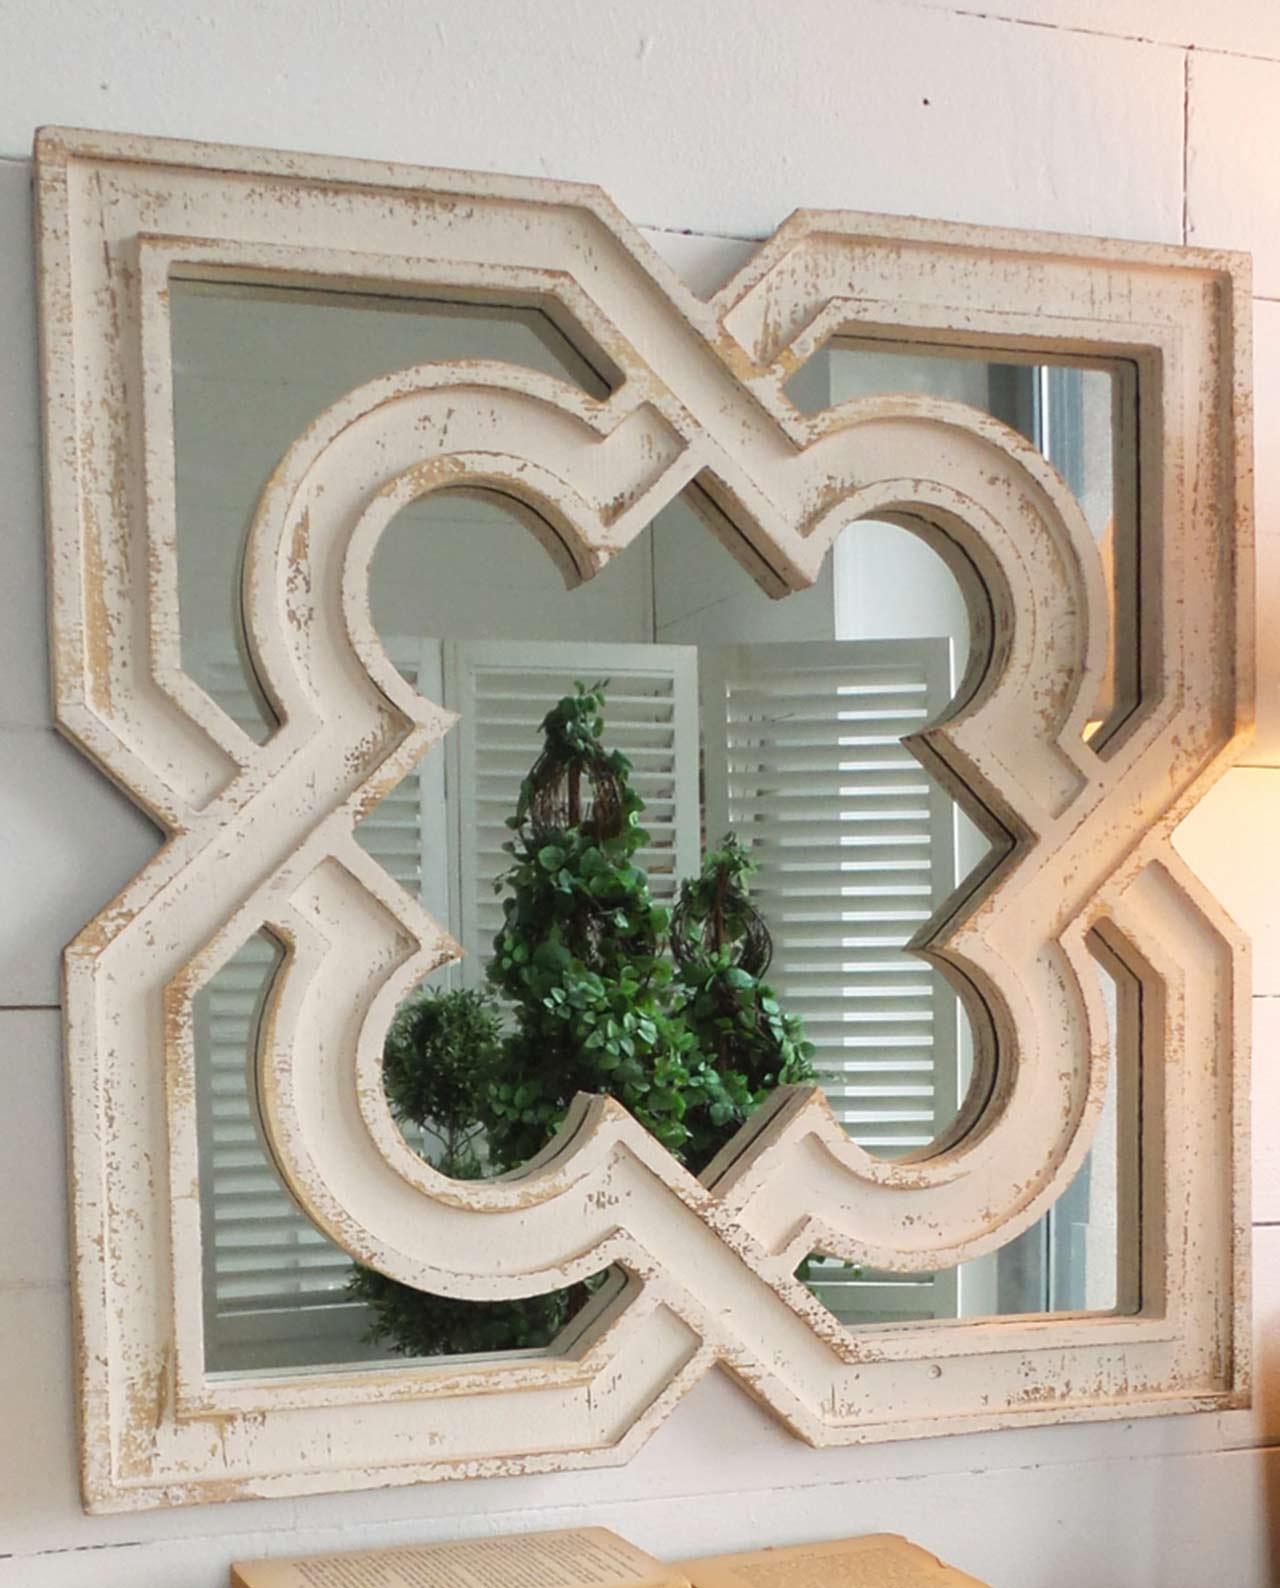 Beautiful specchi da parete particolari with specchiere - Specchi particolari per bagno ...